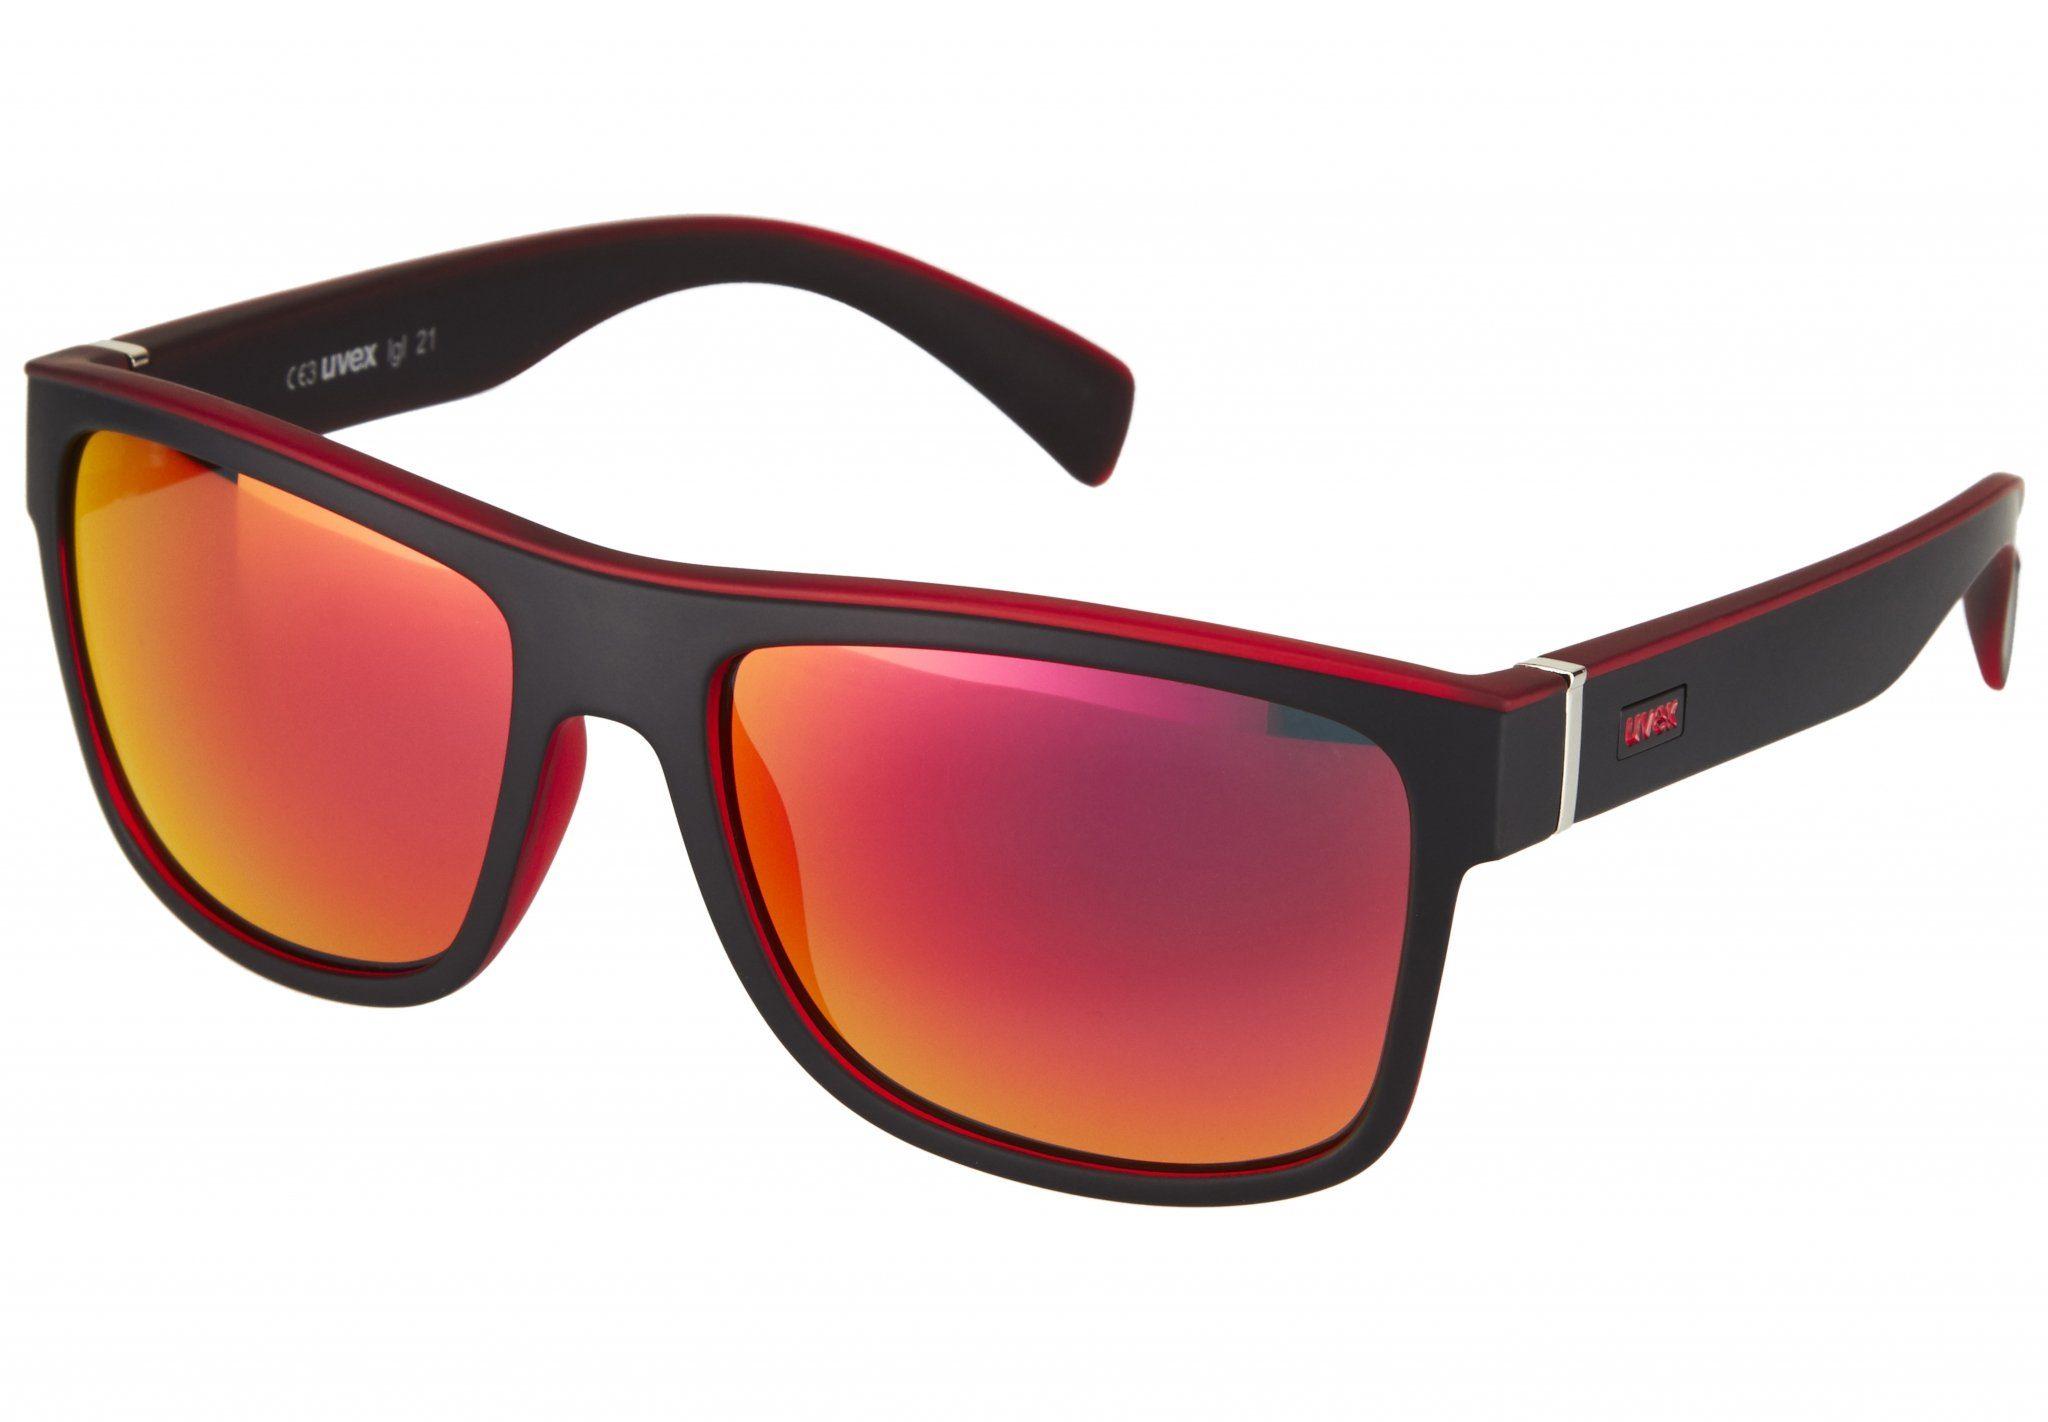 Uvex Sportbrille lgl 21 c1I0eW7D